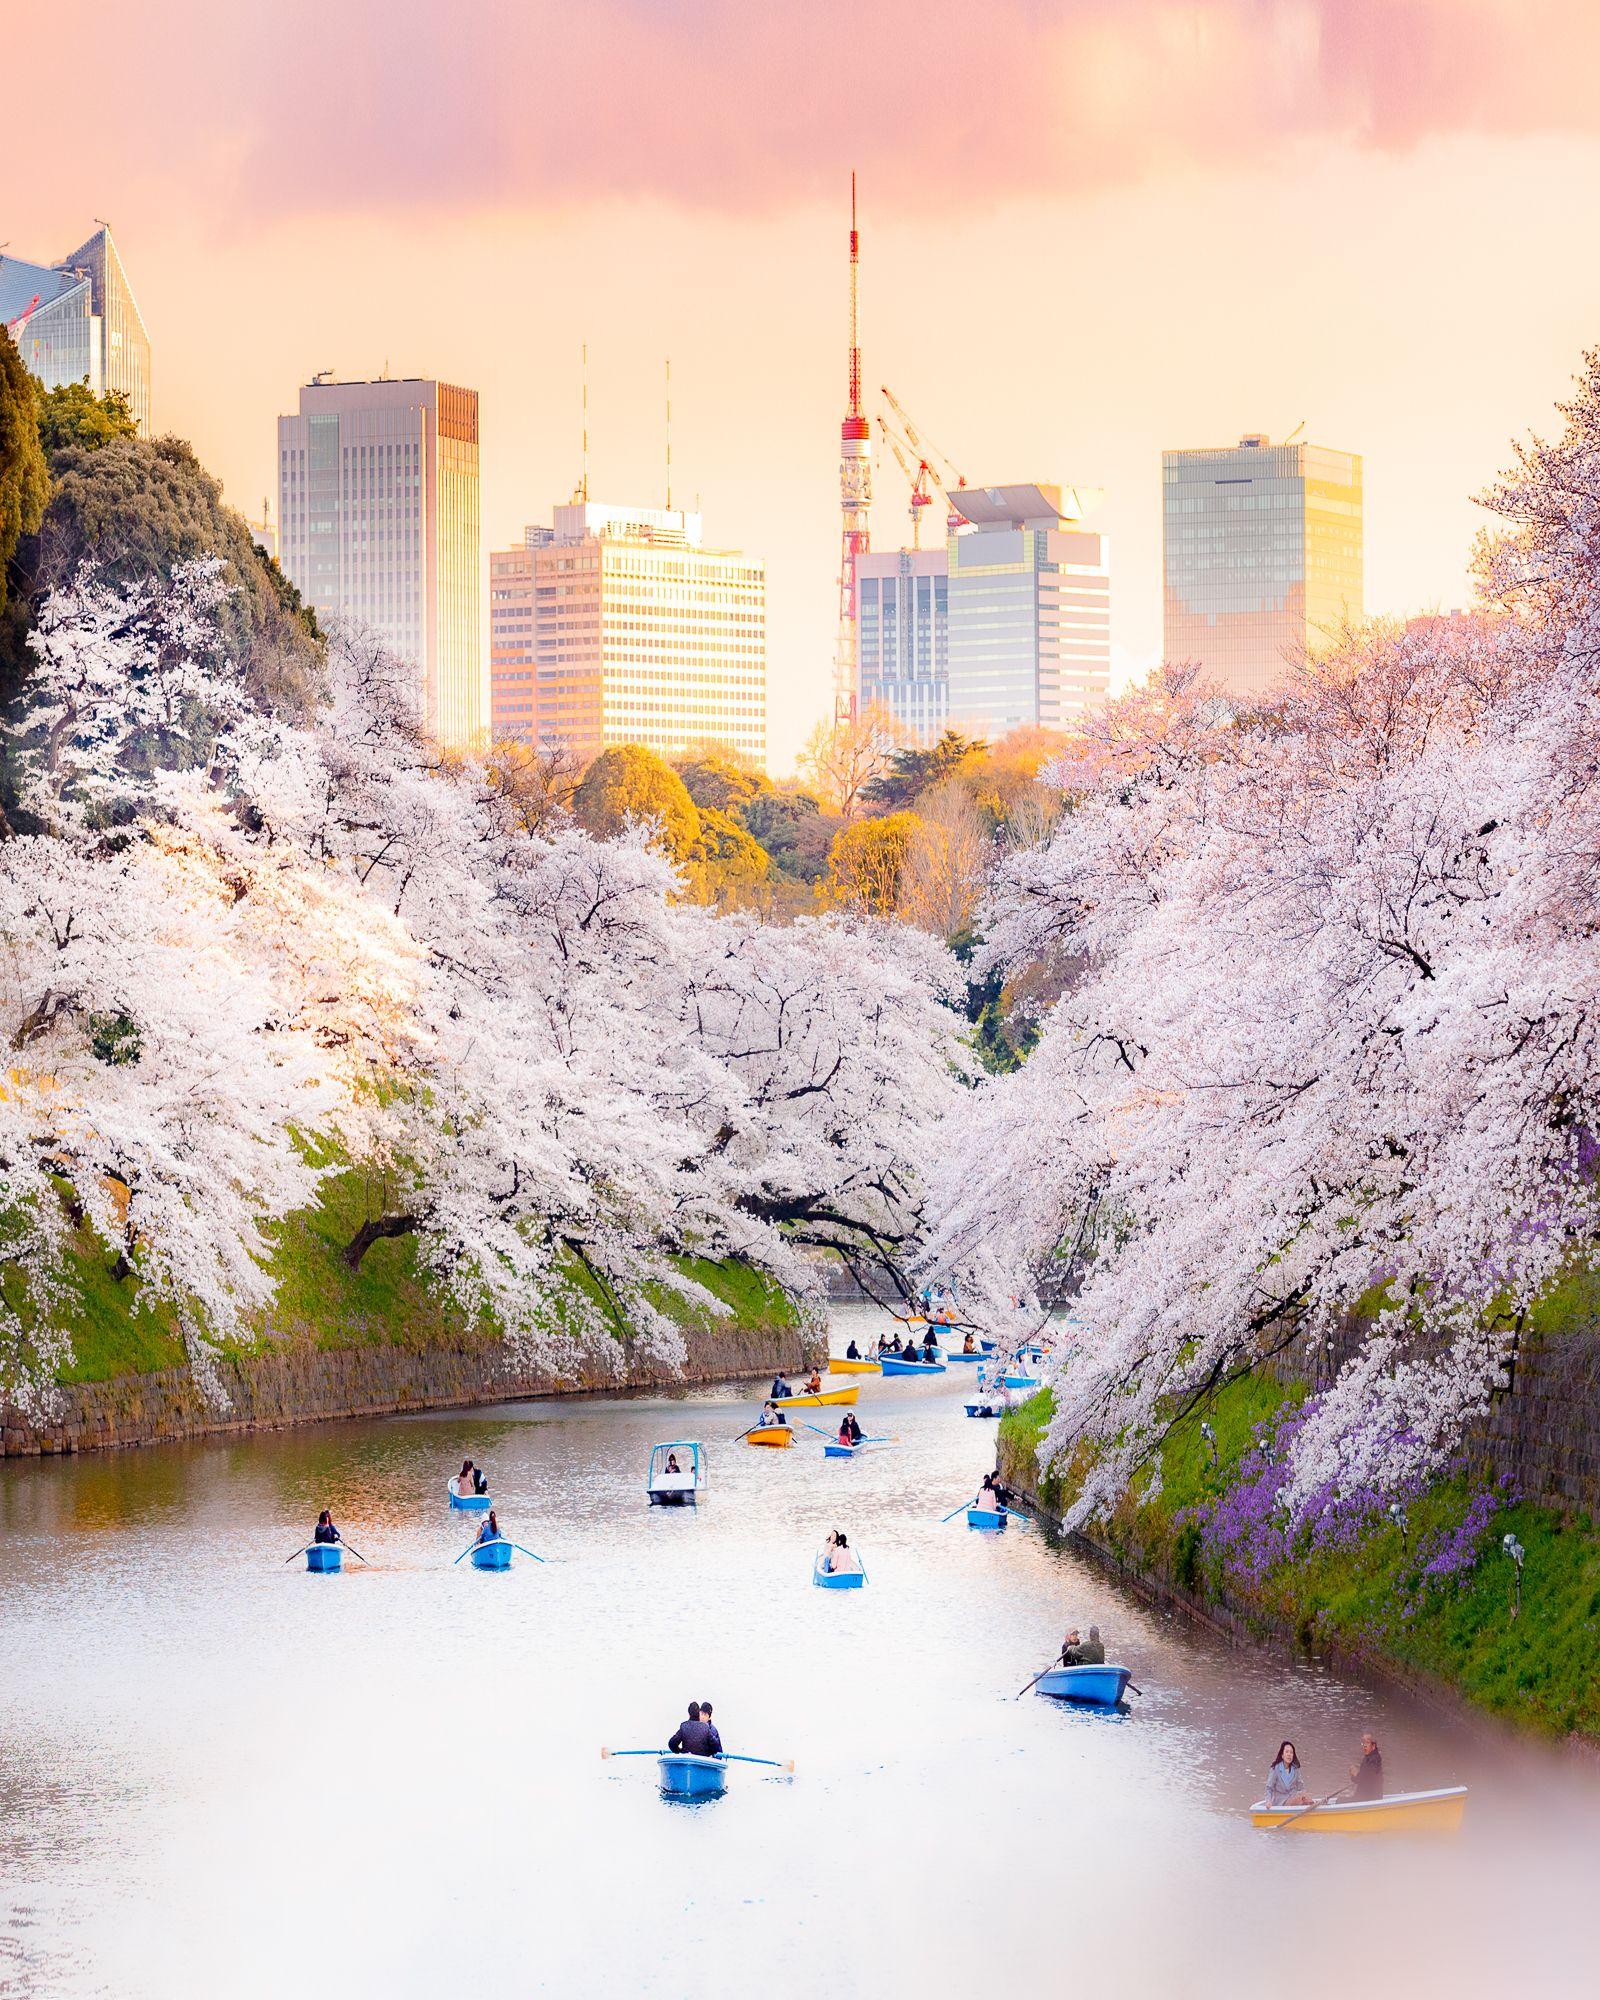 Cherry Blossom In Tokyo At Kitanomaru Park Sakura Japan Cherry Blossom Japan Japan Sakura Tokyo Cherry